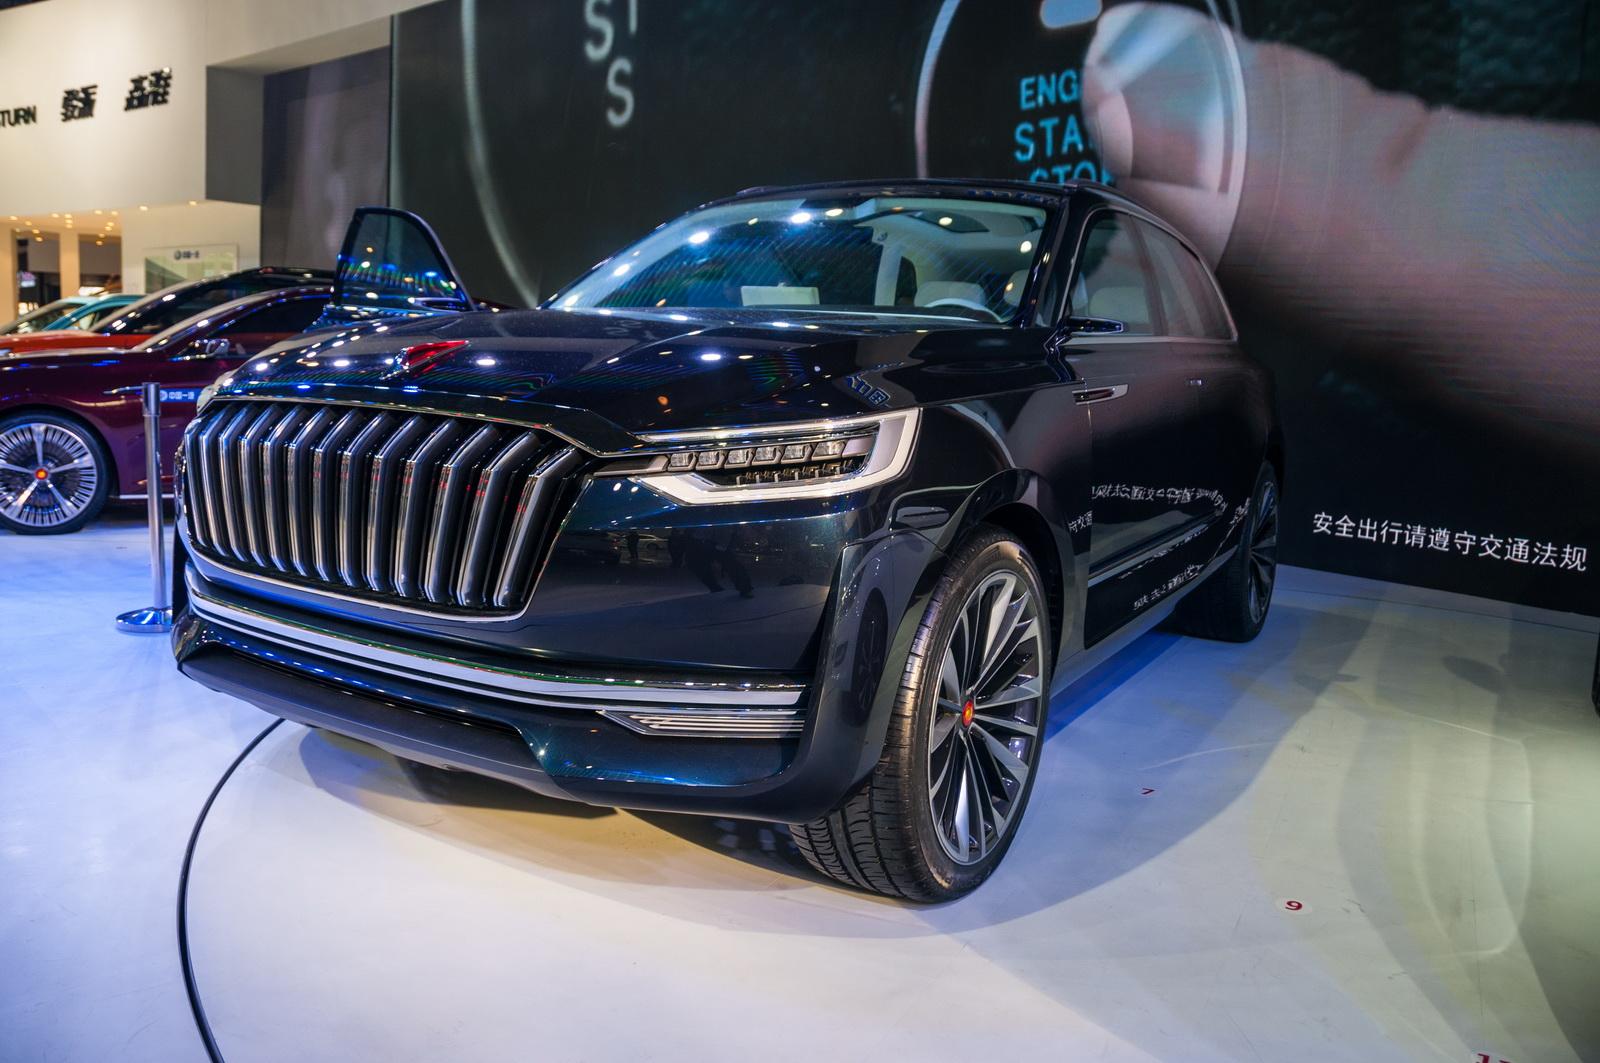 Hongqi S Audi Based S Concept Looks Surprisingly Good